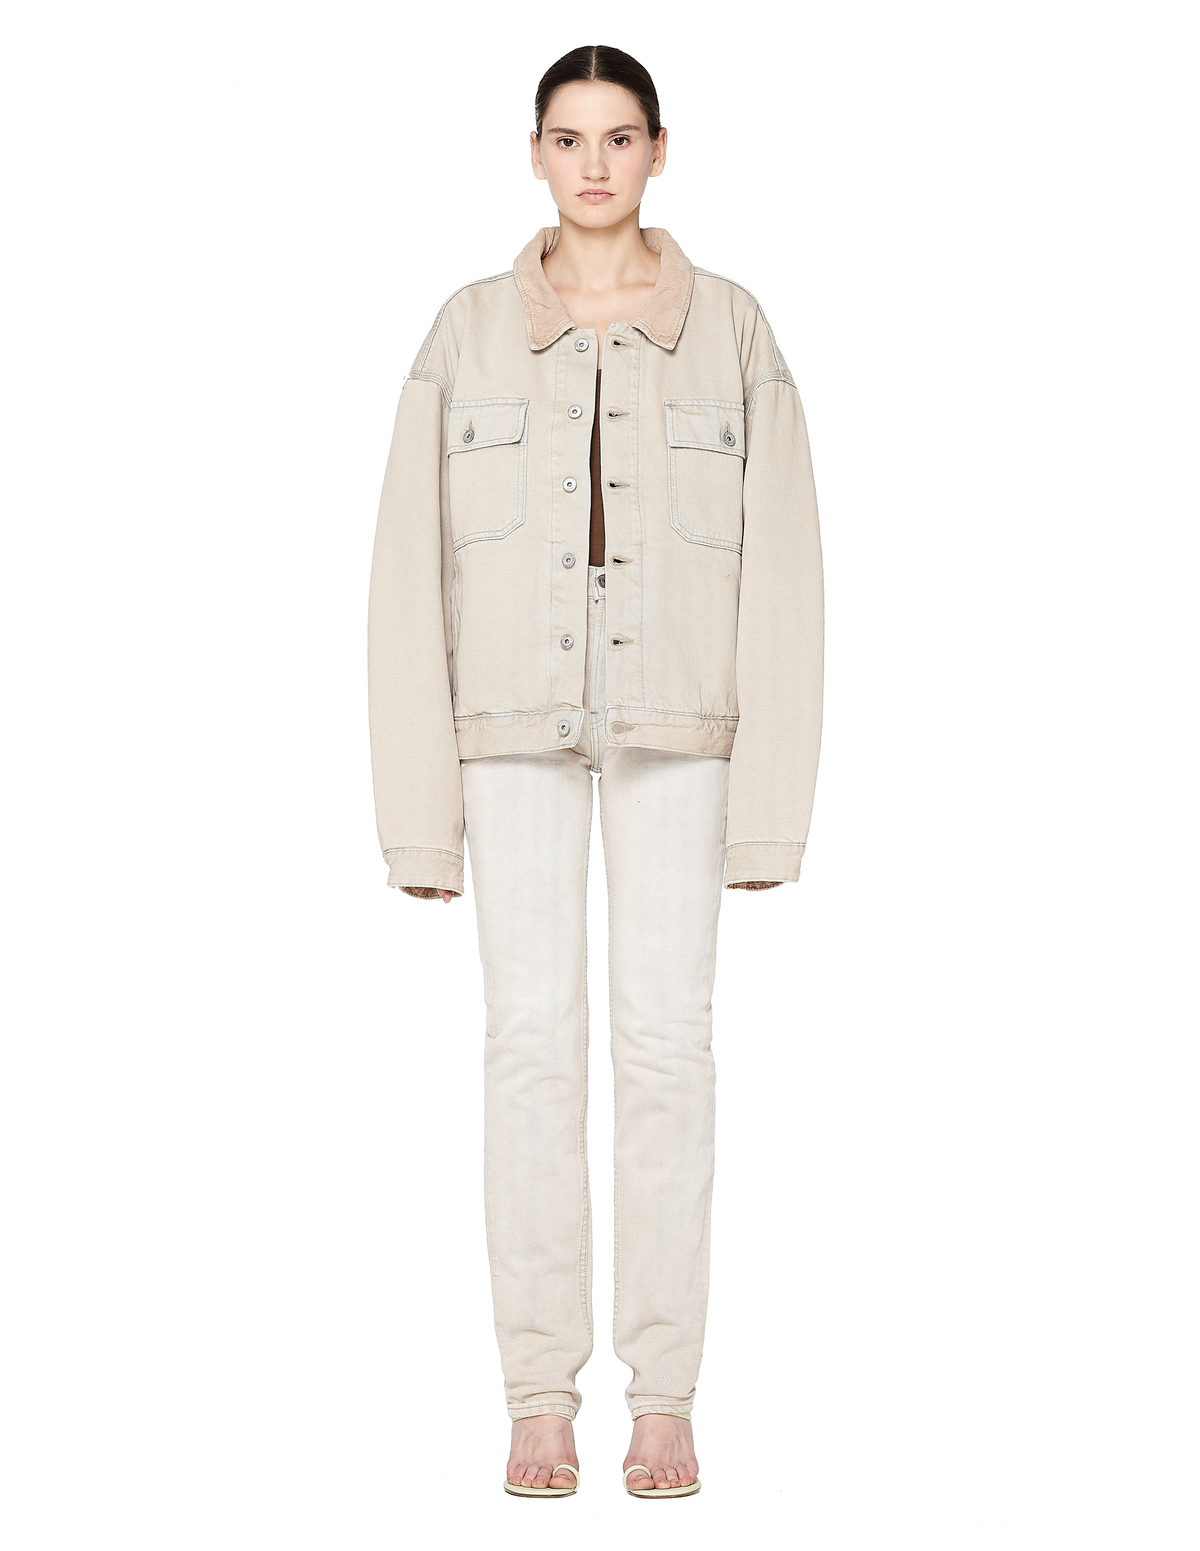 Pockets Denim Jeans - Beige | Garmentory